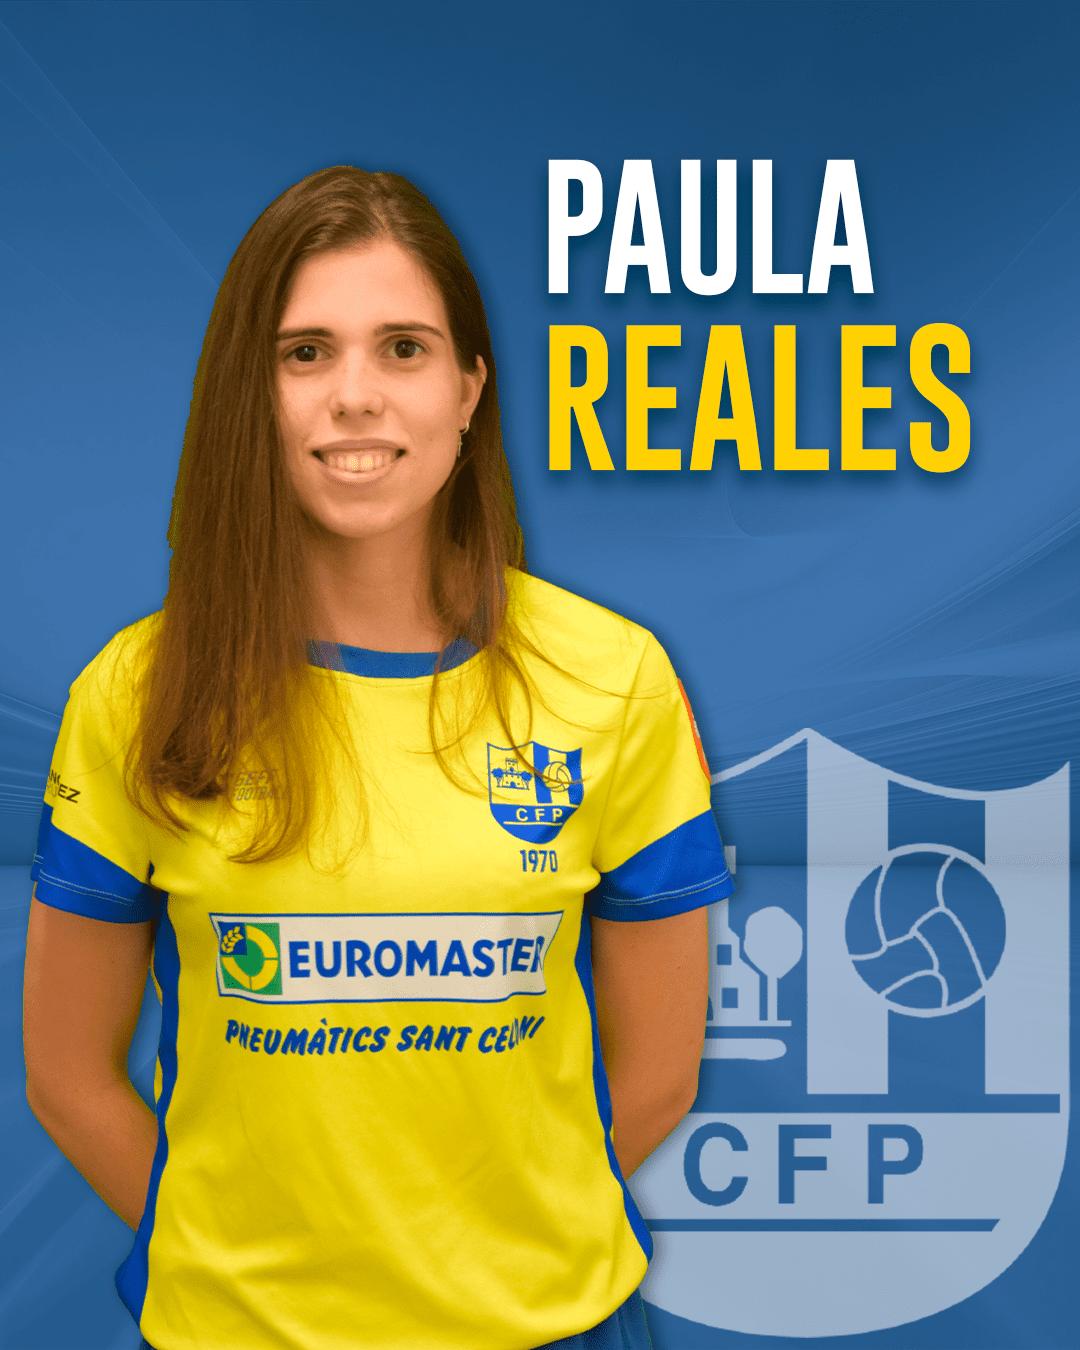 Paula Reales